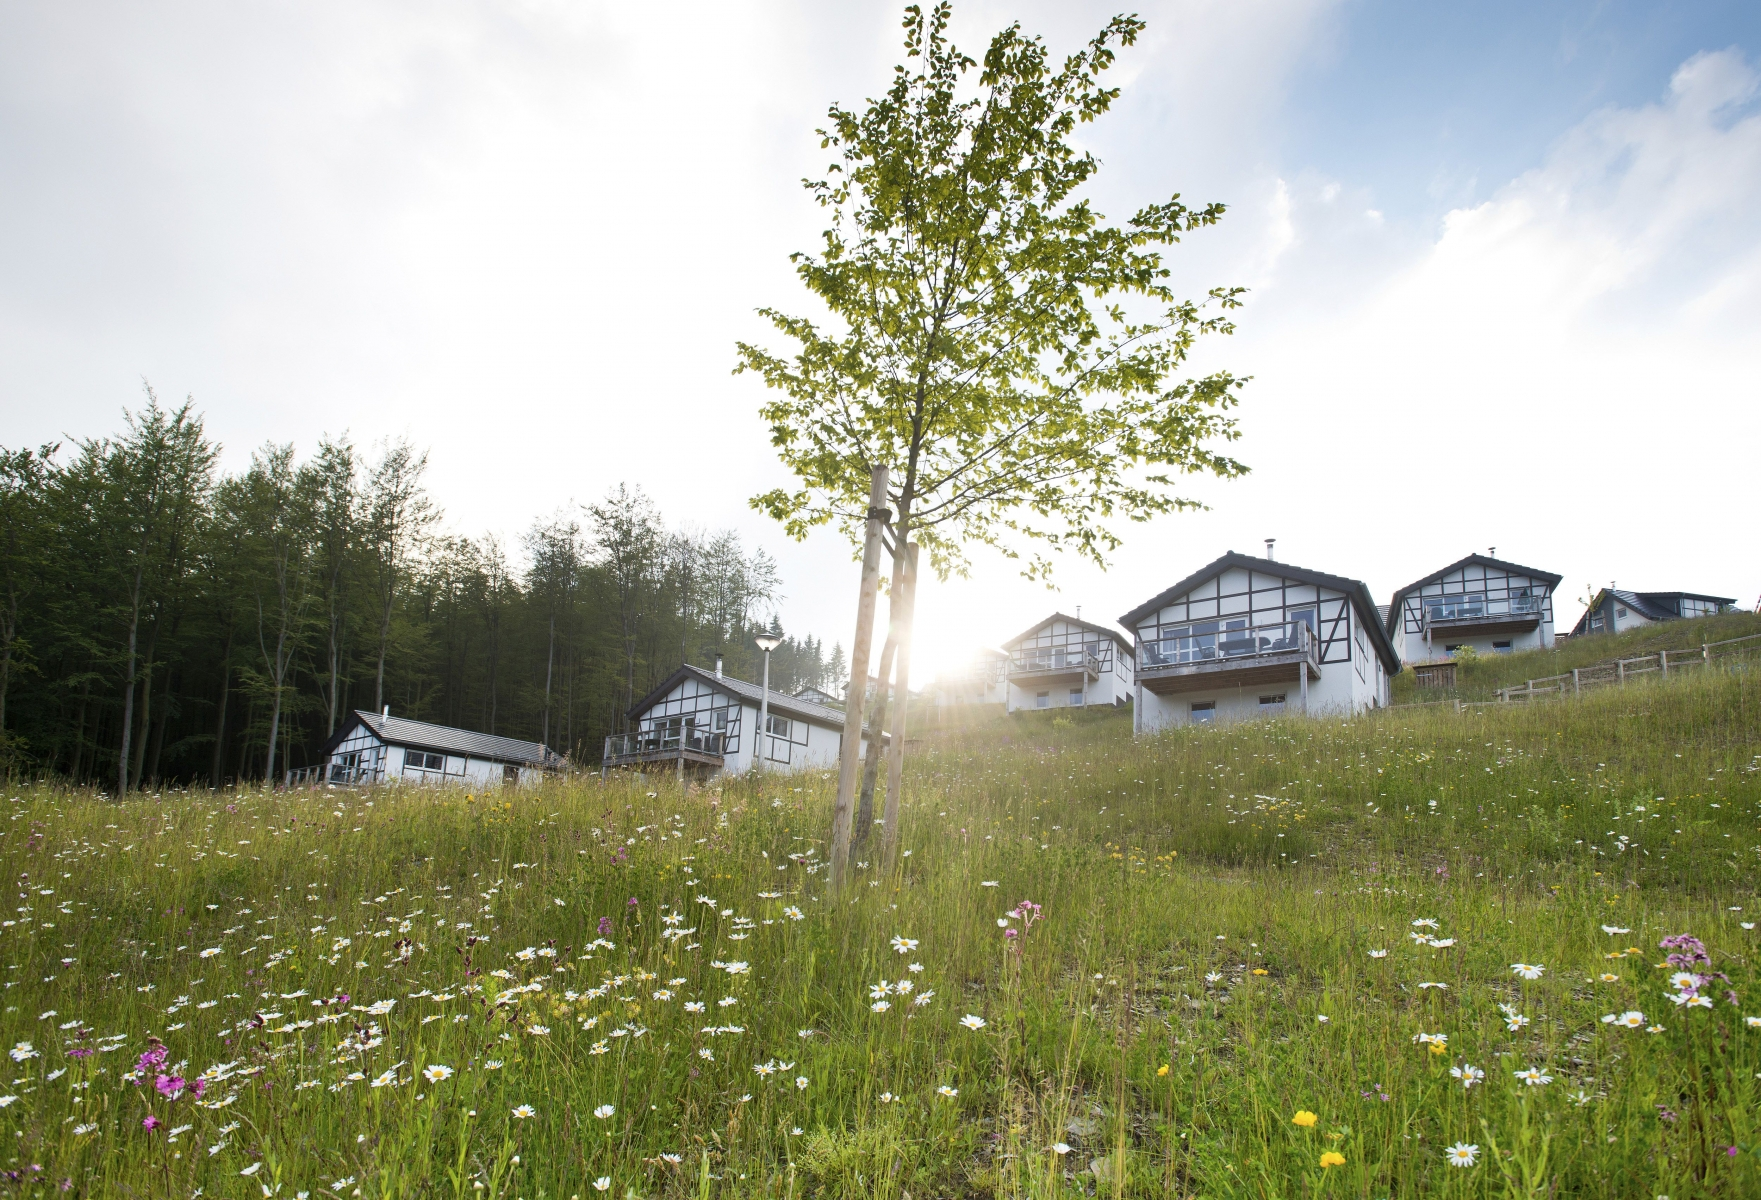 Korting bungalow Sauerland 🏕️Landal Winterberg